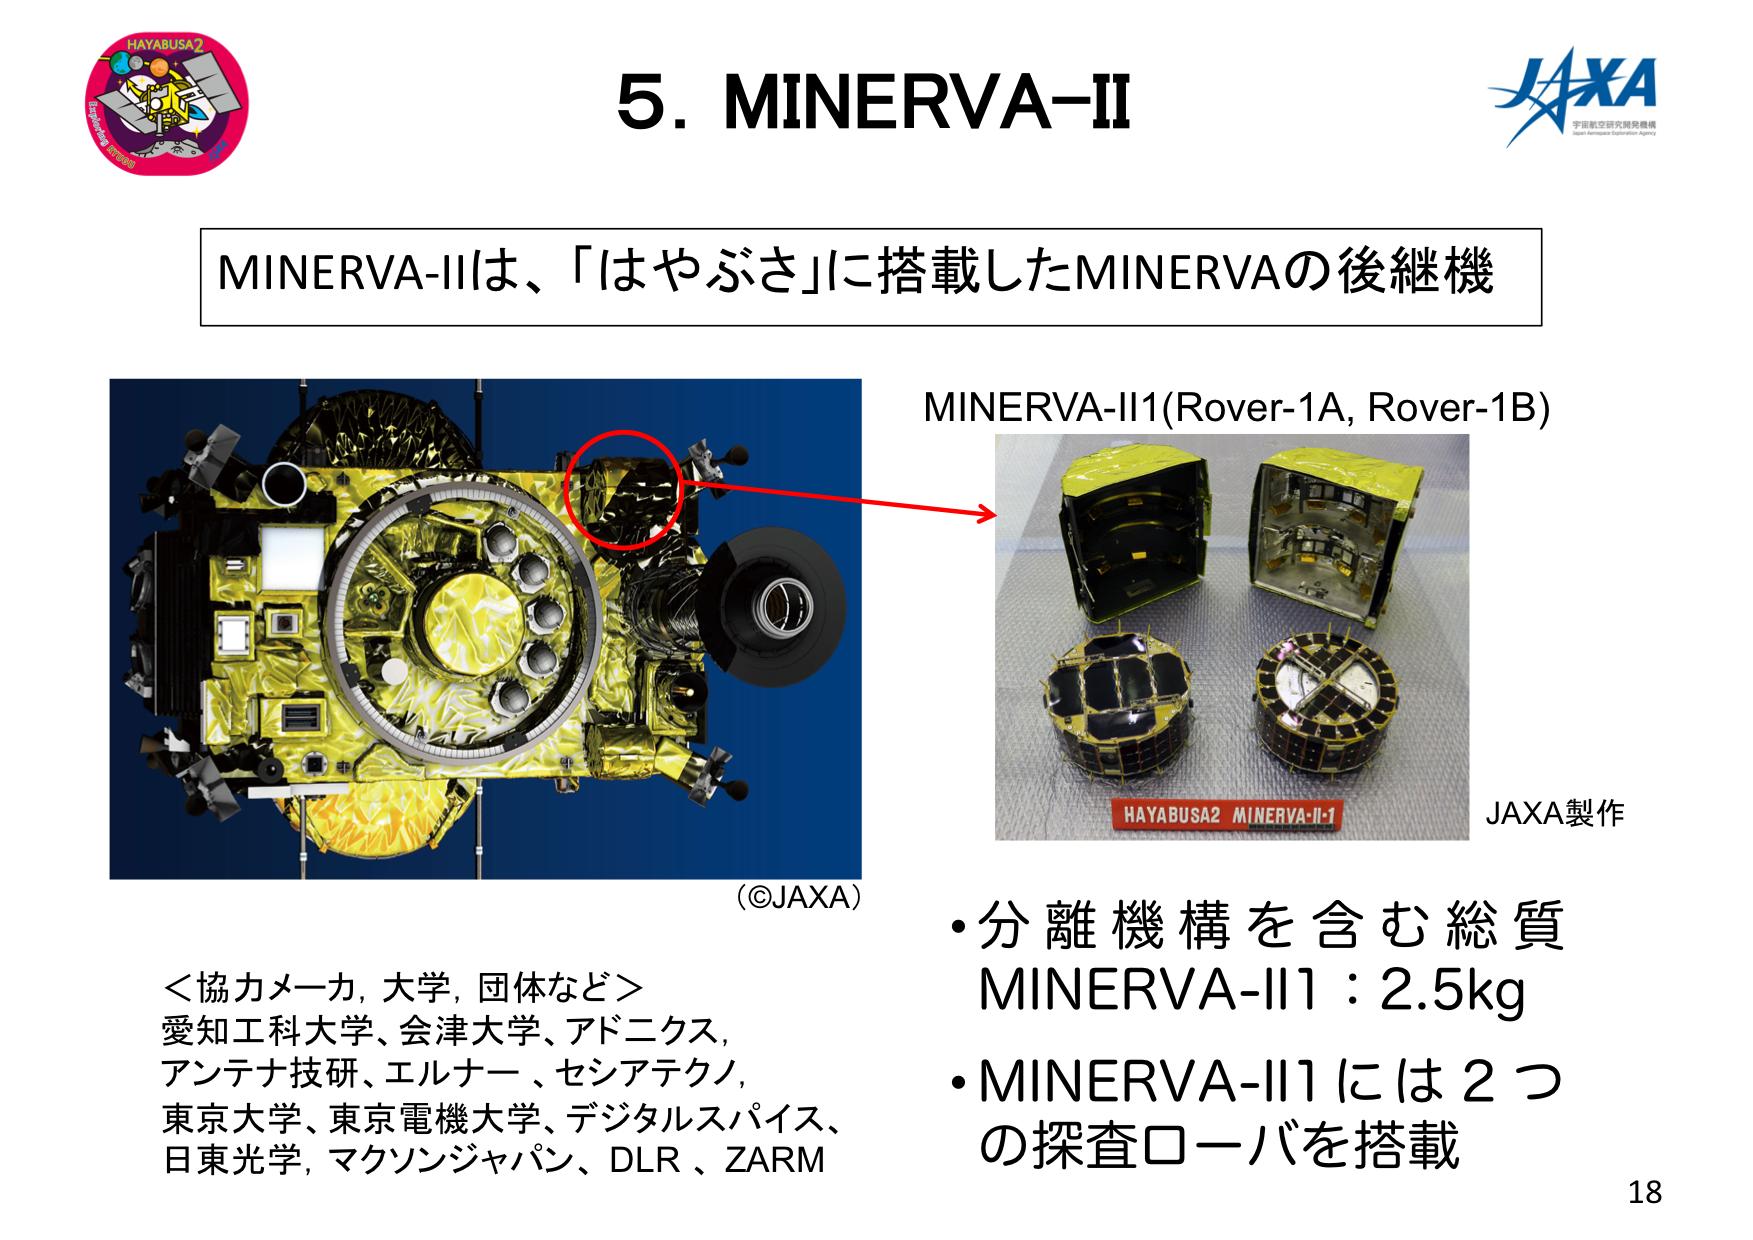 f:id:Imamura:20180905231950p:plain